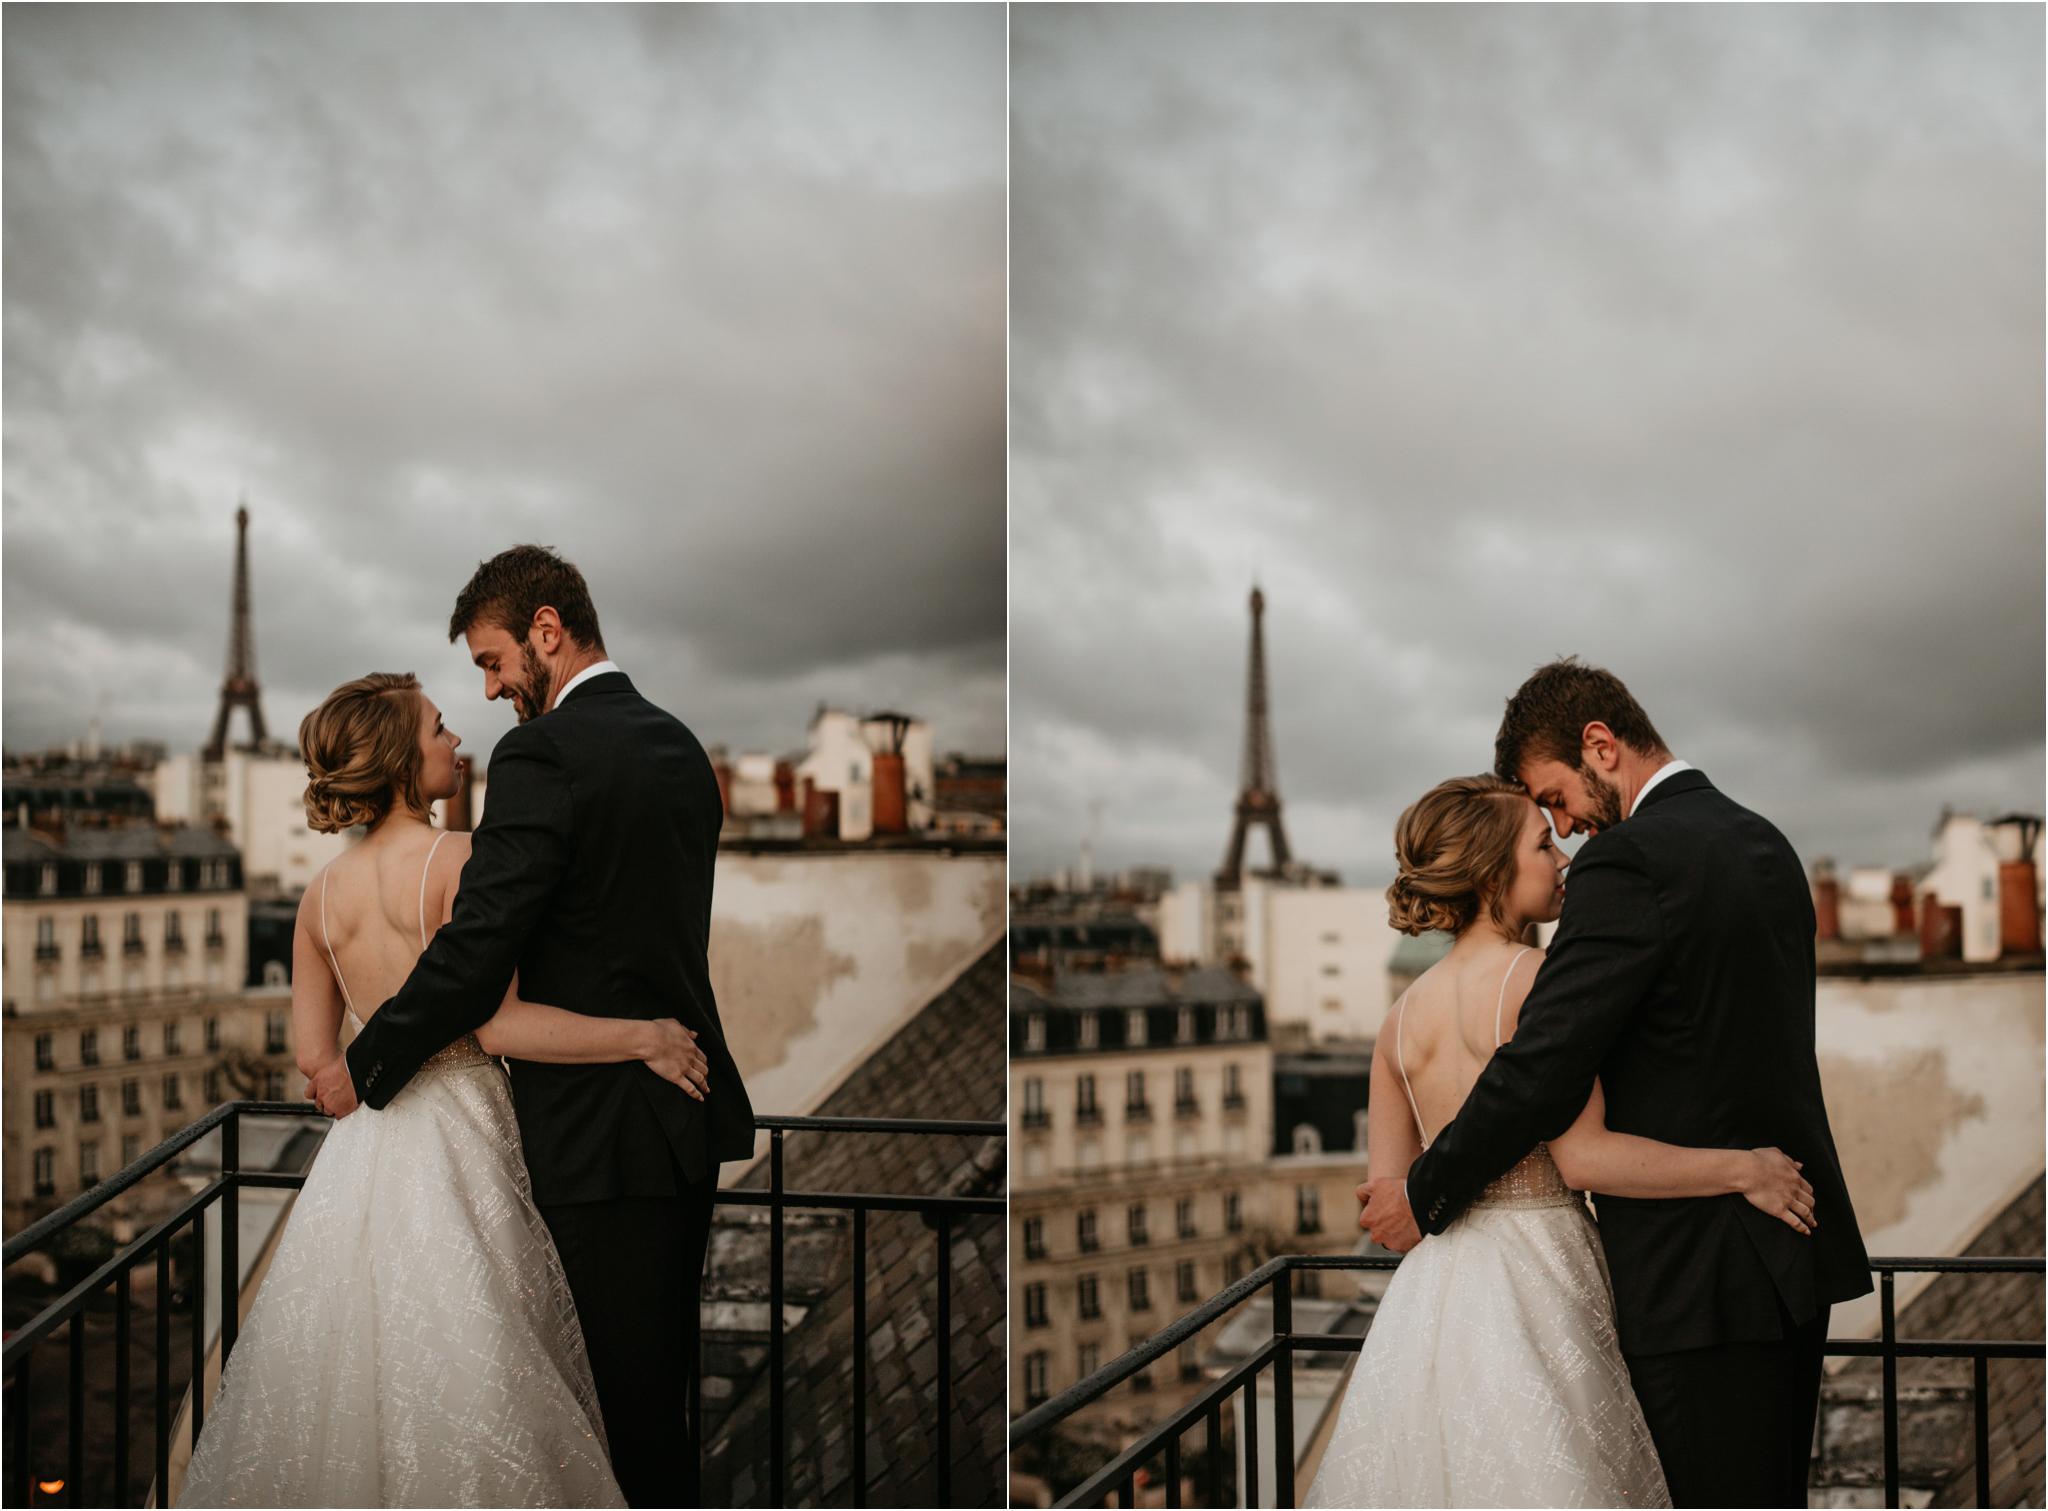 miranda-and-jared-paris-elopement-destination-wedding-photographer-022.jpg